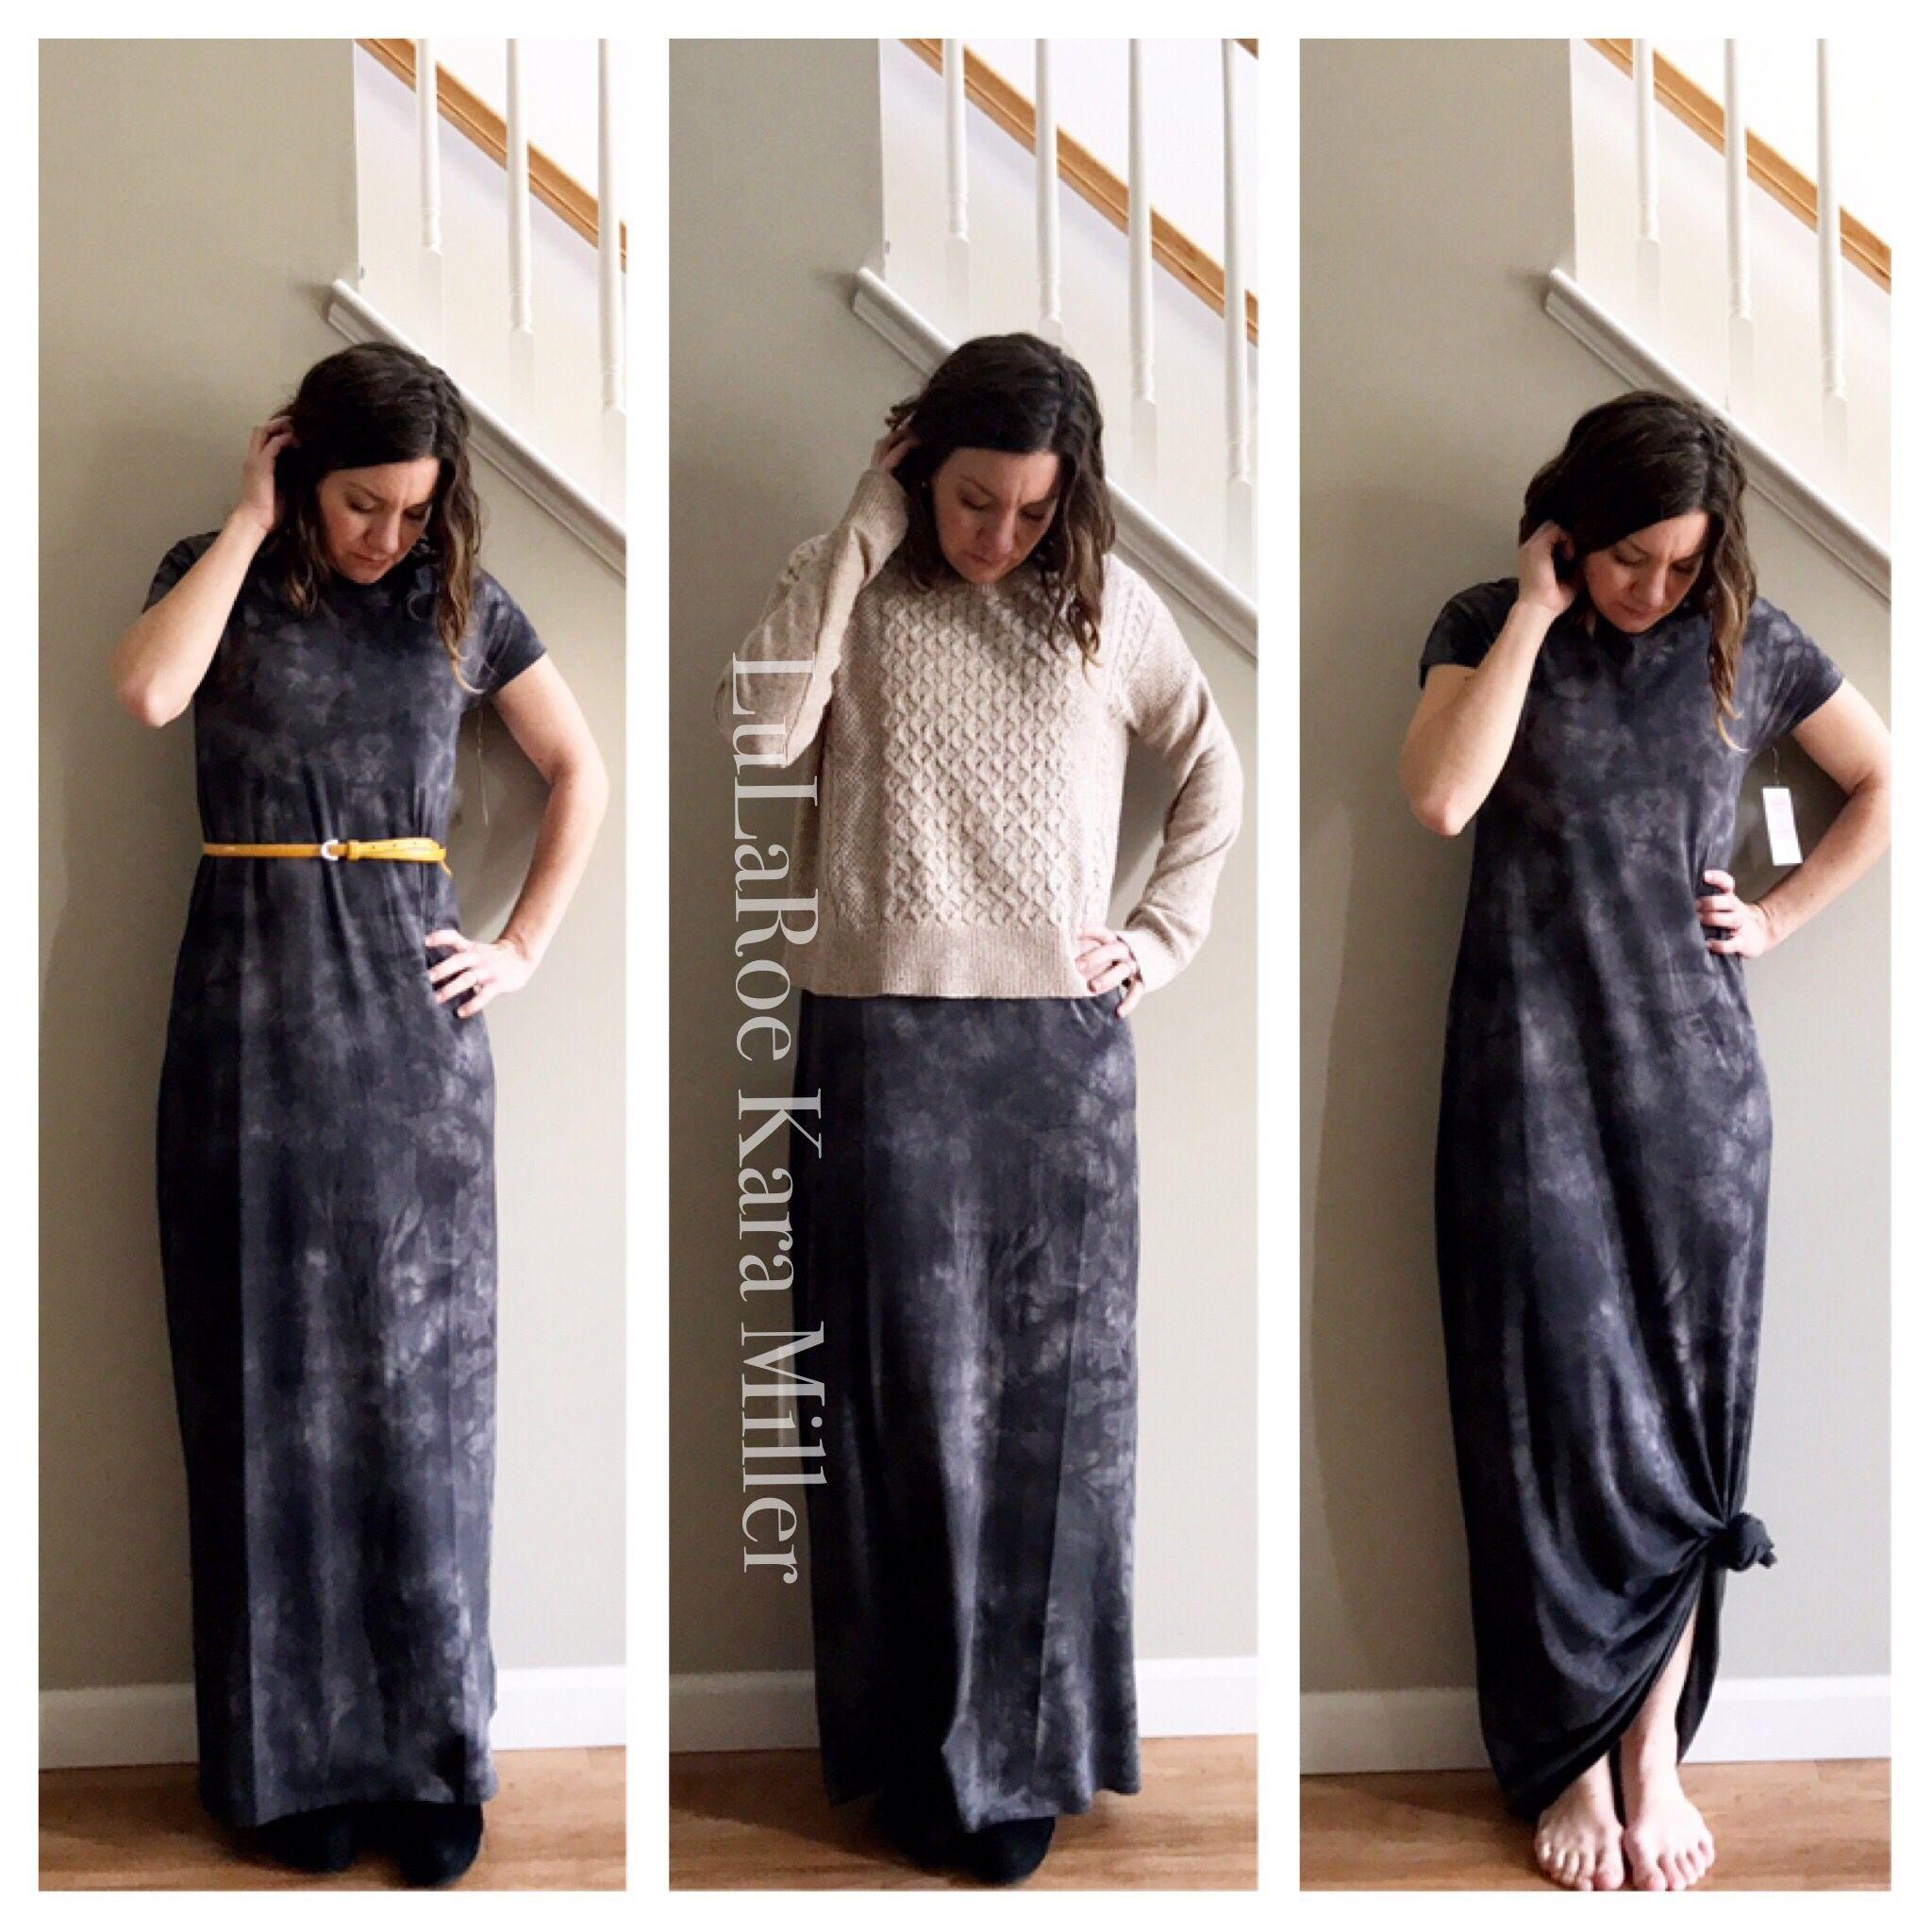 e43133bebf930c Ways to style a LuLaRoe Maria Dress! With a belt, with an oversized cropped